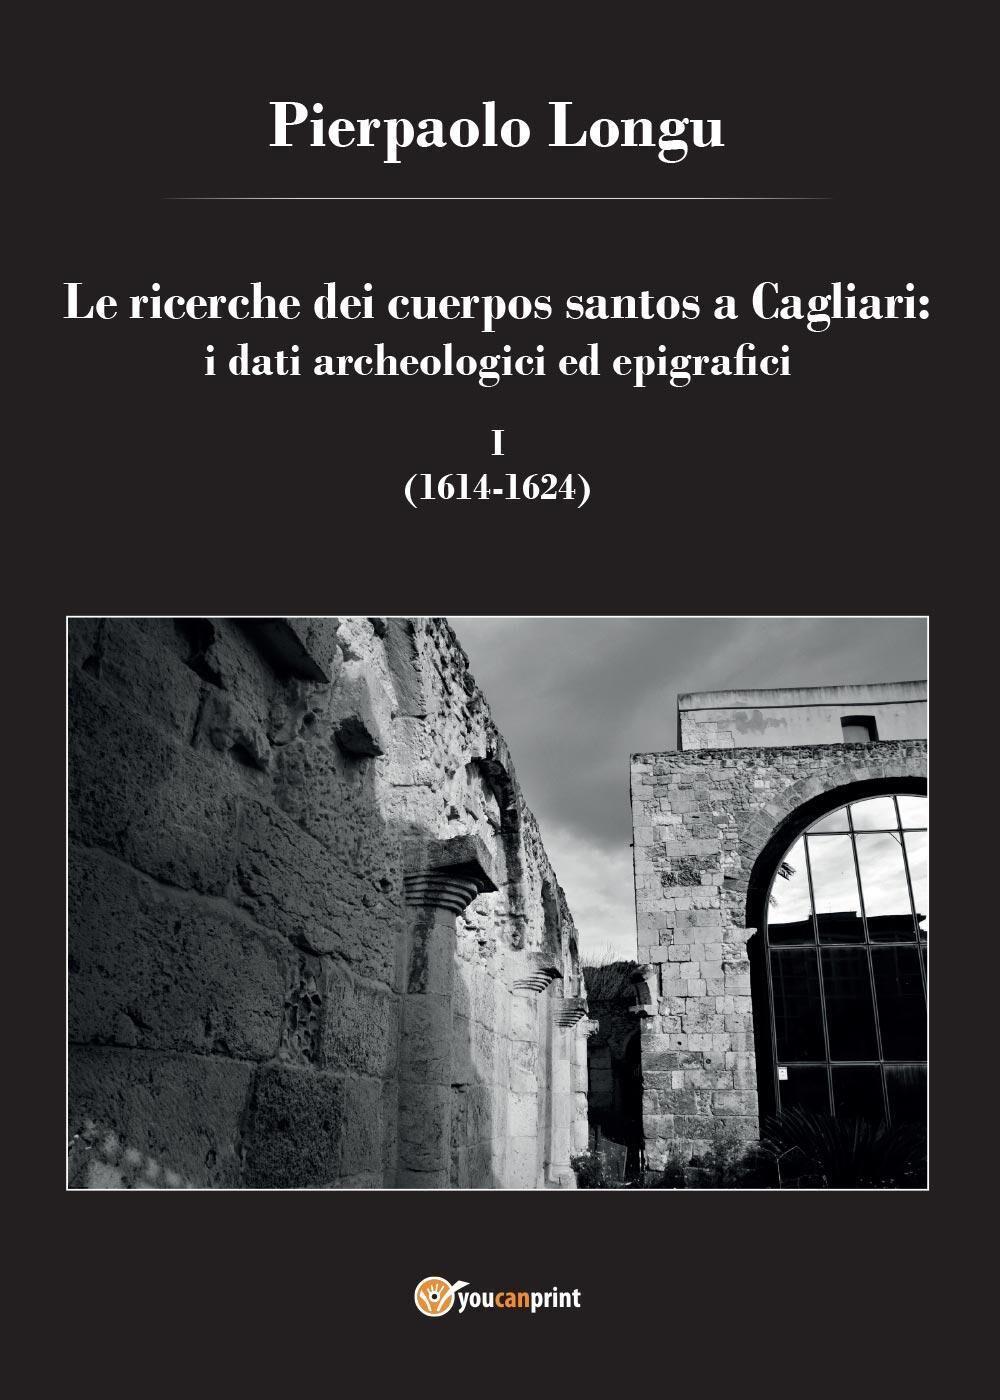 Le ricerche dei cuerpos santos a Cagliari: i dati archeologici ed epigrafici. Vol. 1: (1614-1624).